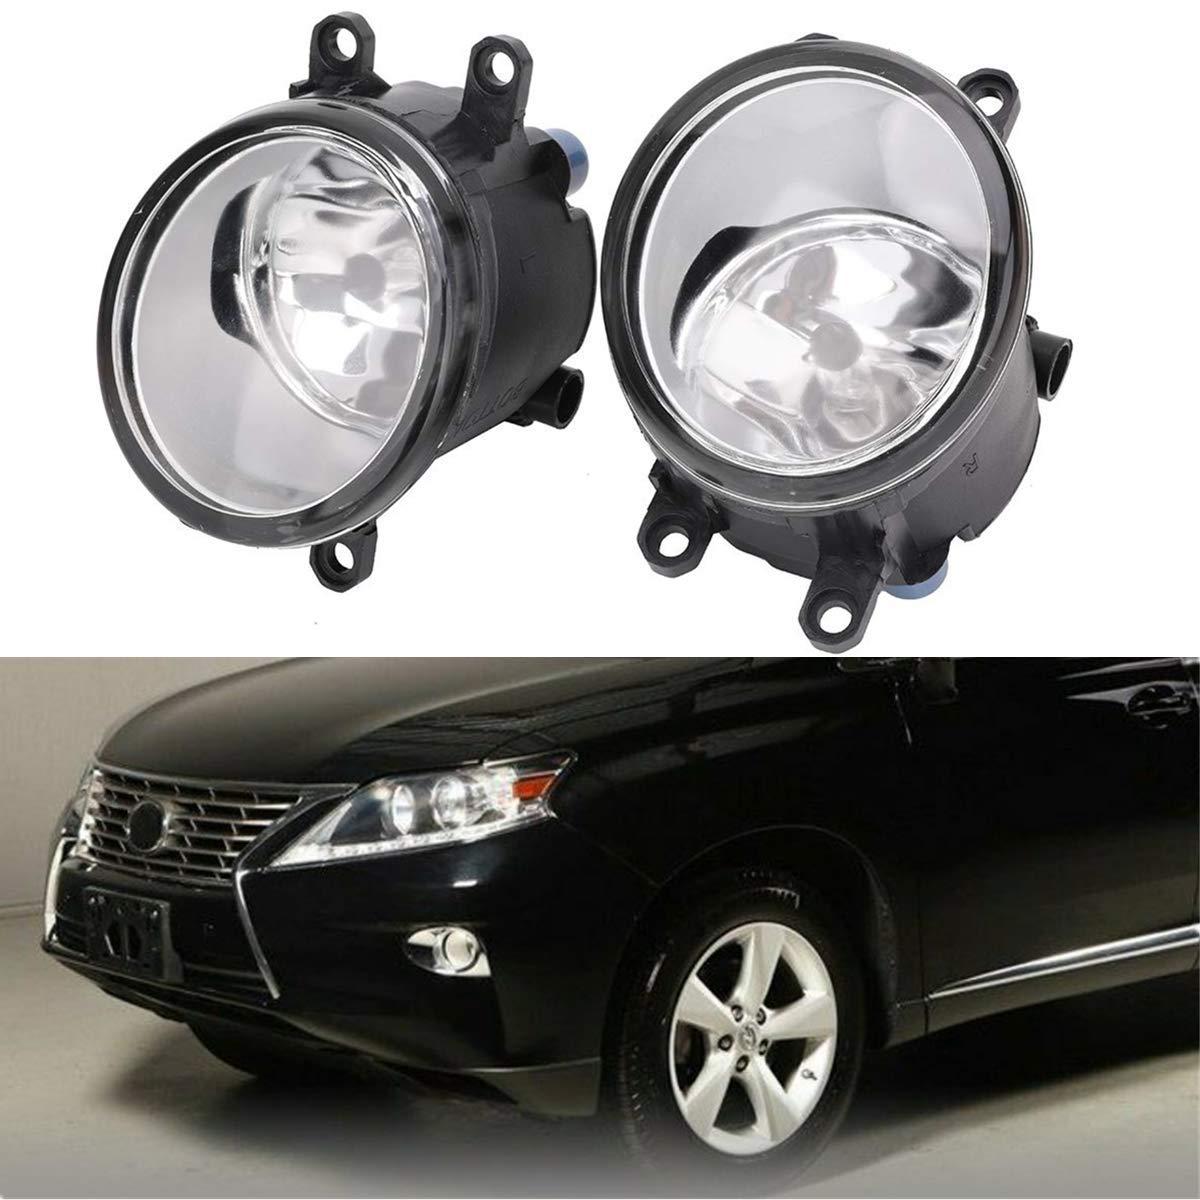 Clear Fits Winjet 09-12 Toyota Venza Fog Lights Lens Wiring Kit